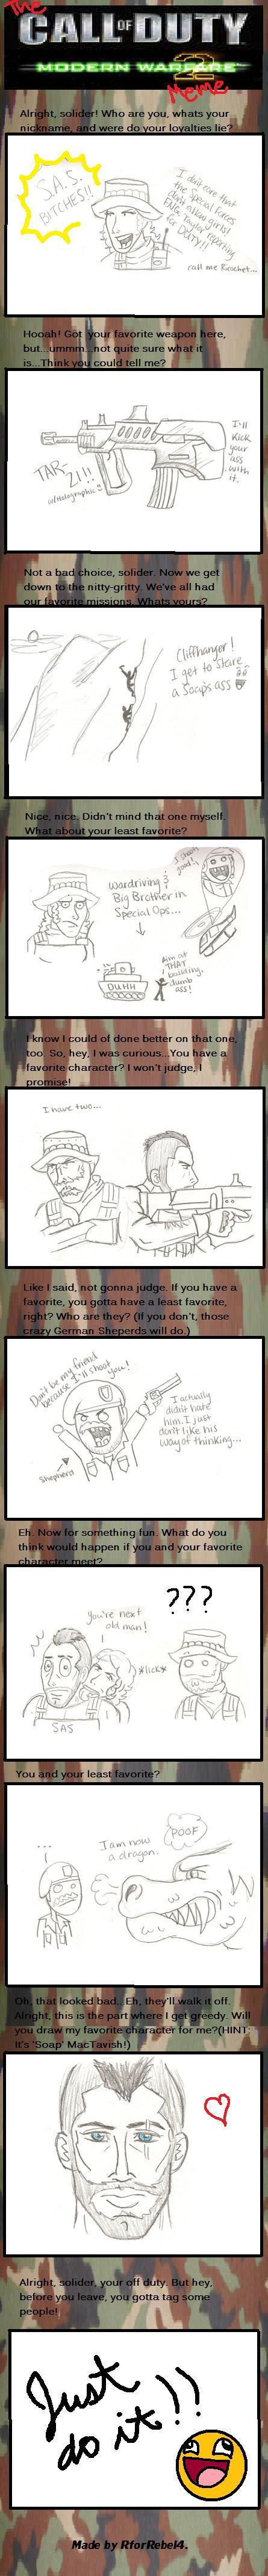 MW2 Meme by chocolatetater-tot